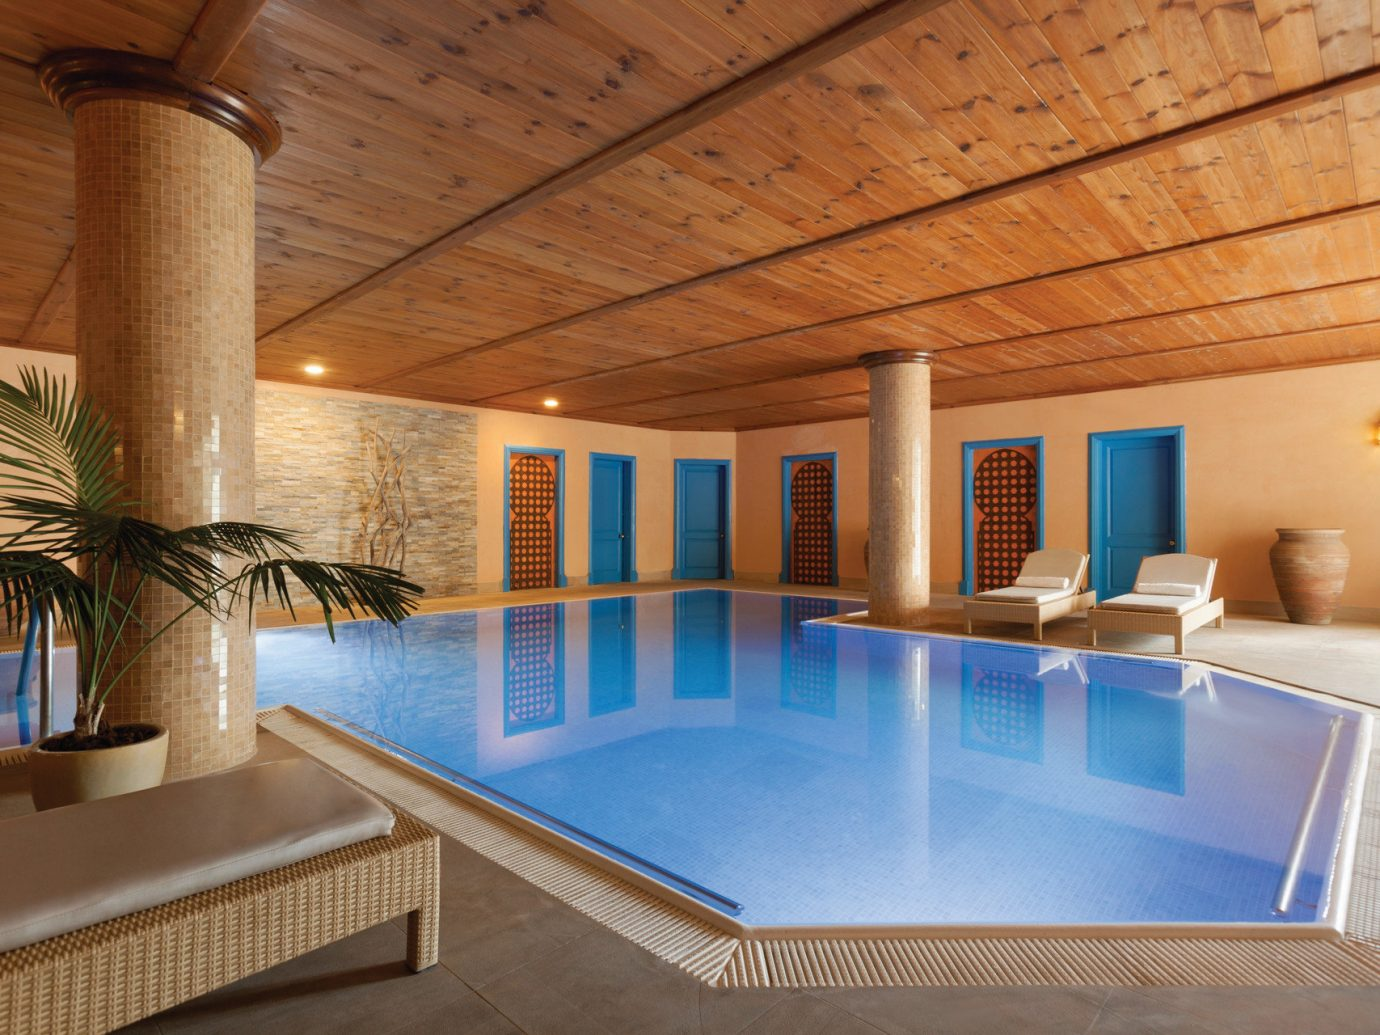 Trip Ideas indoor ceiling swimming pool property room estate Villa Resort floor real estate interior design jacuzzi mansion